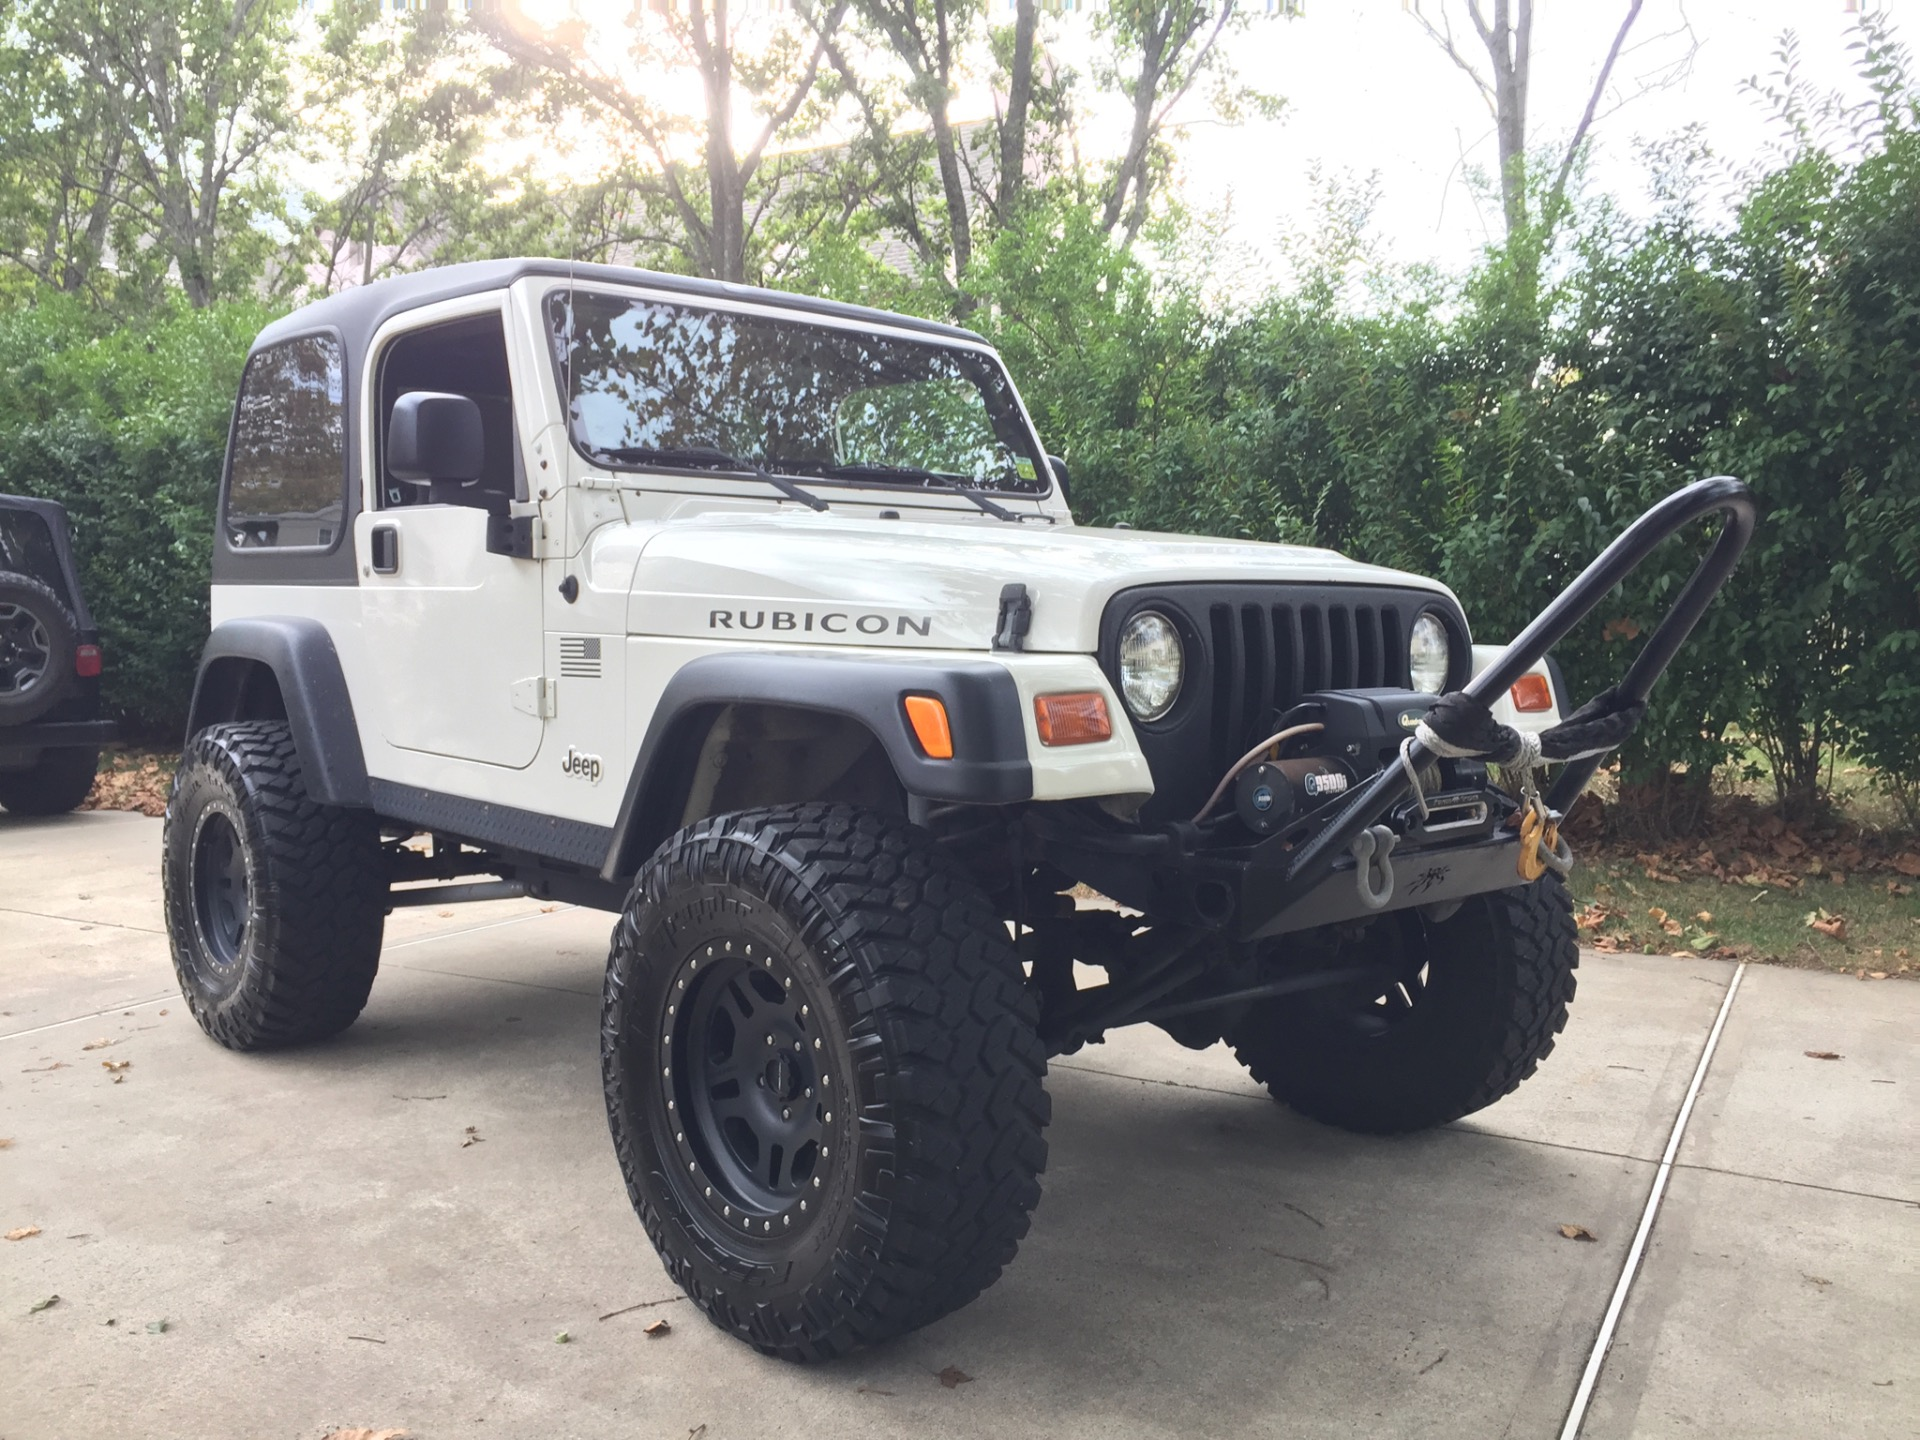 Used-2003-Jeep-Wrangler-Rubicon-Automatic-Rubicon